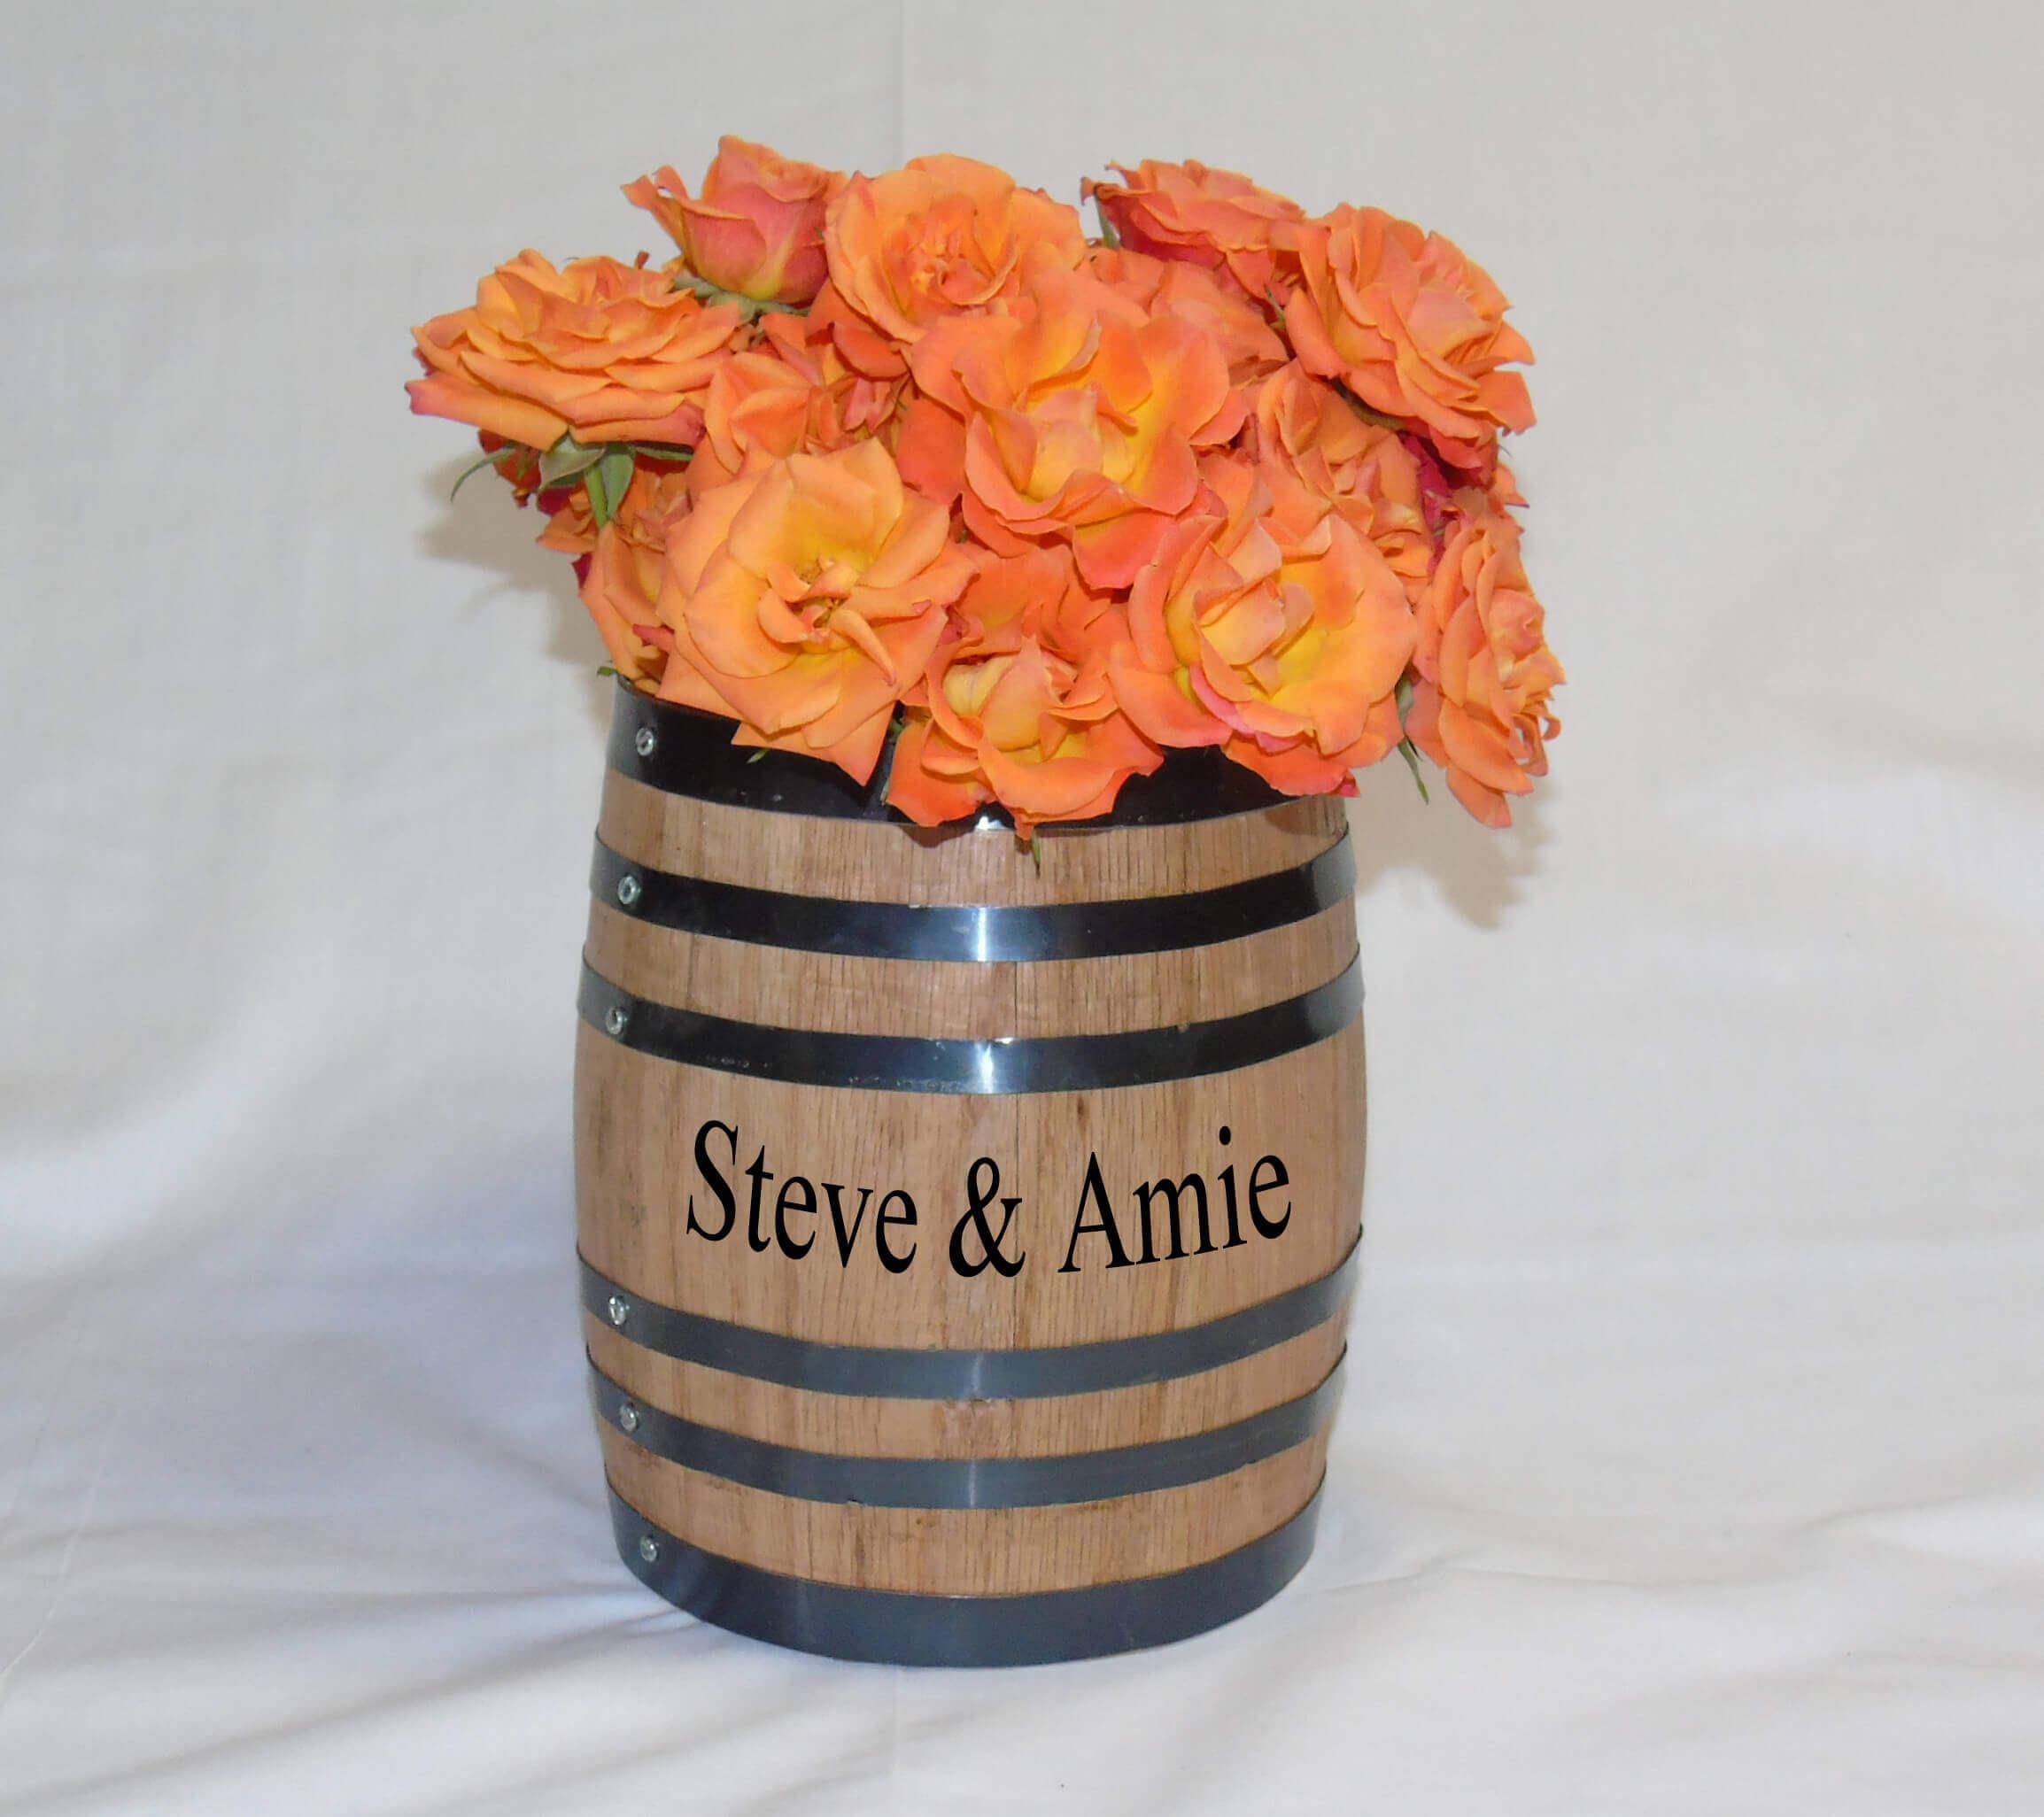 Oak barrel centerpiece flower vase red head oak barrels aging click to enlarge reviewsmspy